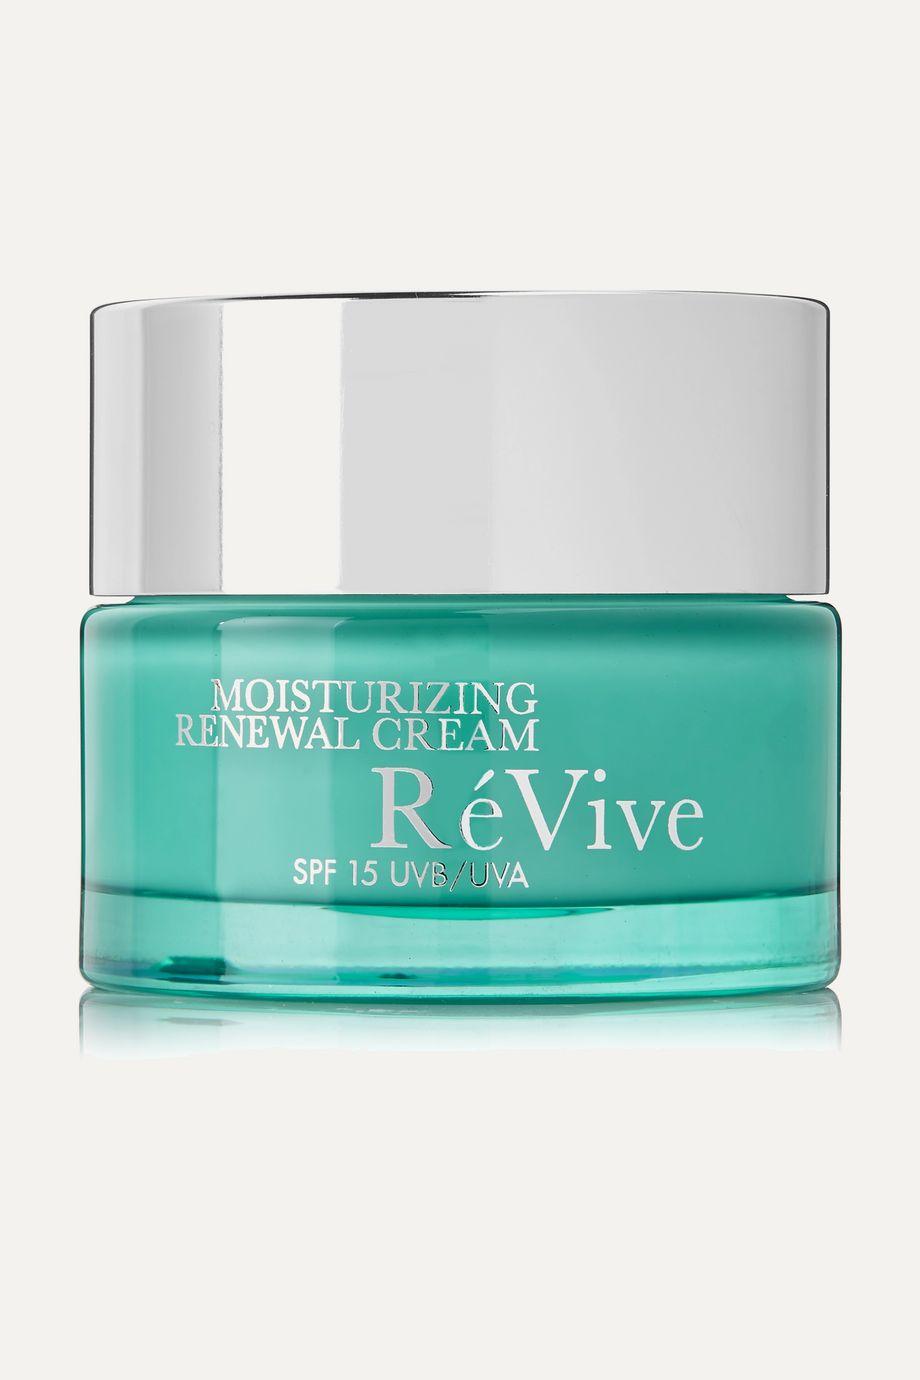 RéVive Moisturizing Renewal Cream SPF15, 50ml